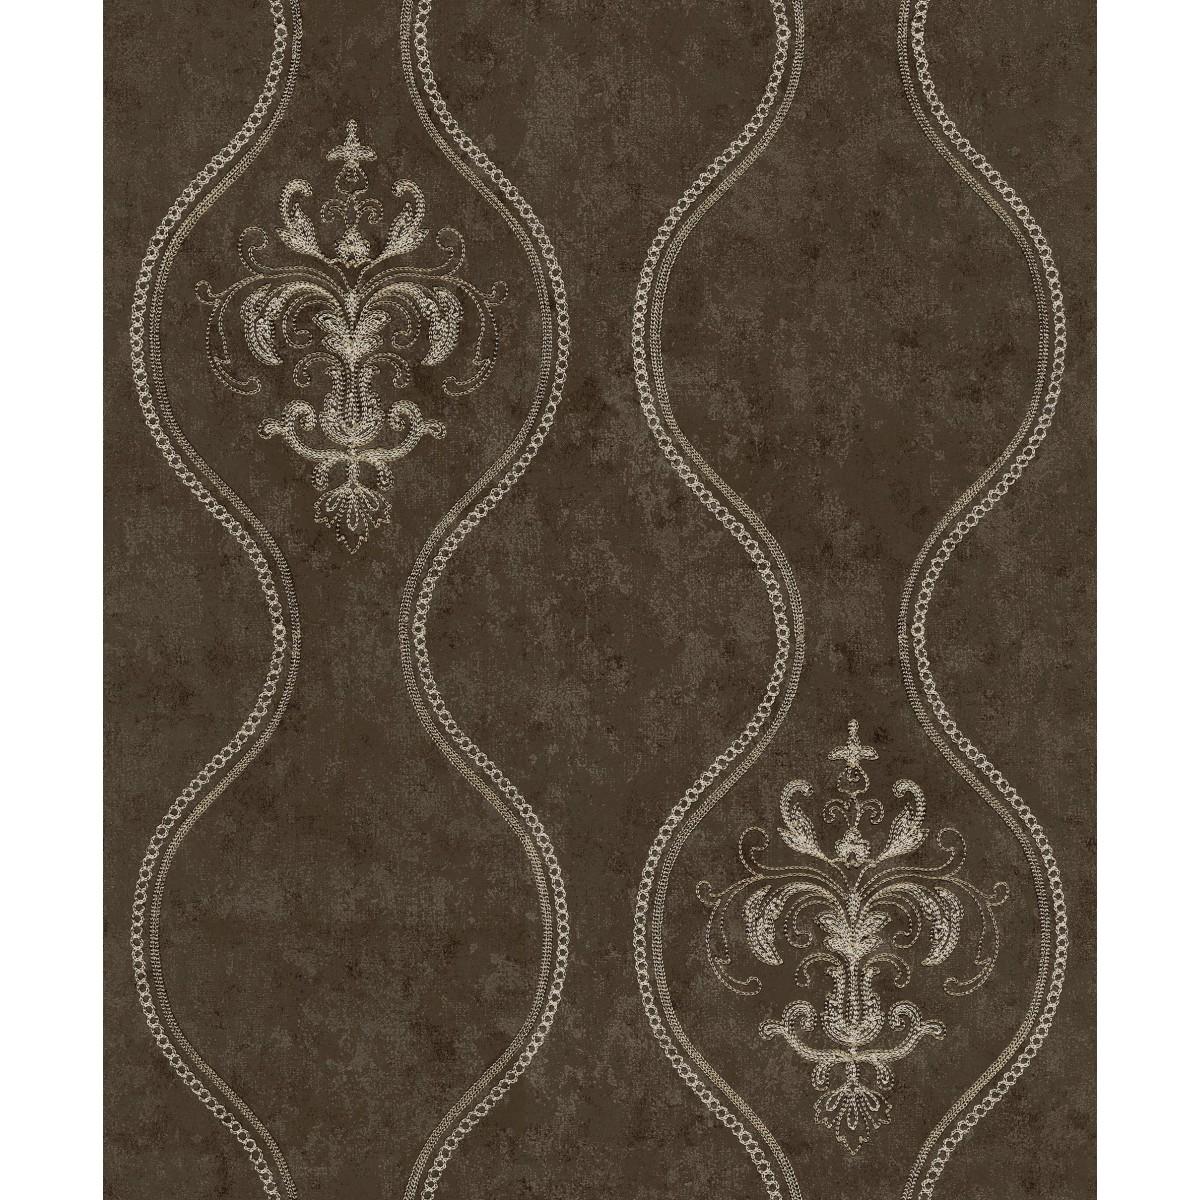 Обои флизелиновые Wiganford Melange коричневые 0.53 м XSS0705